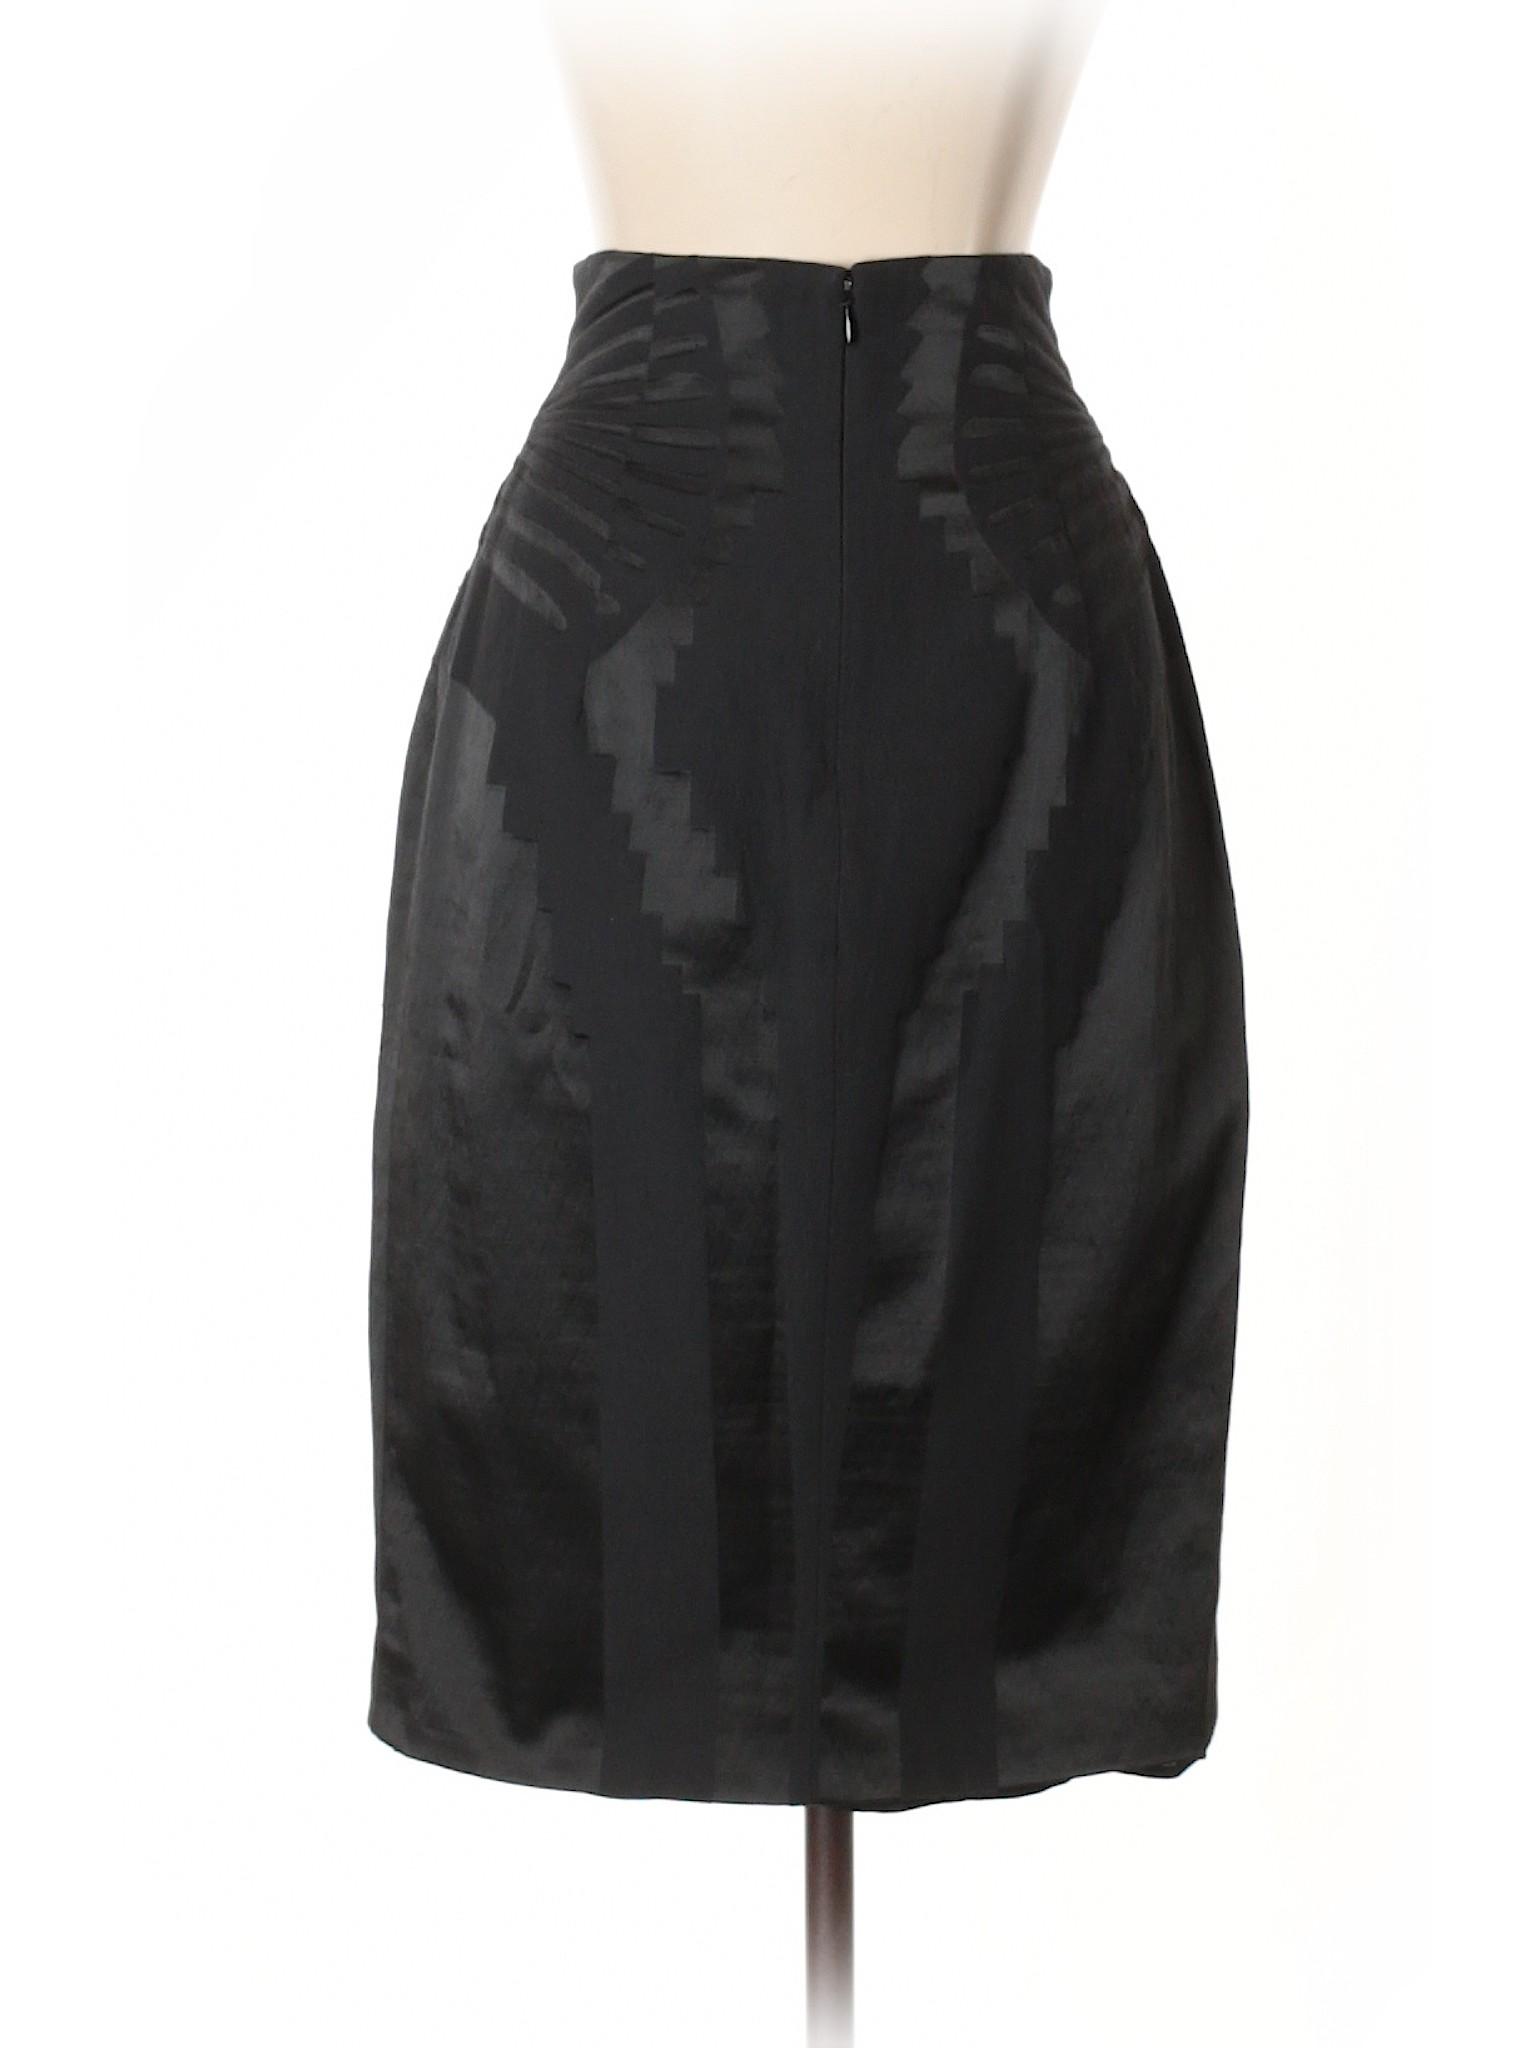 Boutique Skirt Skirt Casual Casual Casual Skirt Boutique Boutique Skirt Casual Boutique OwqHxZq8